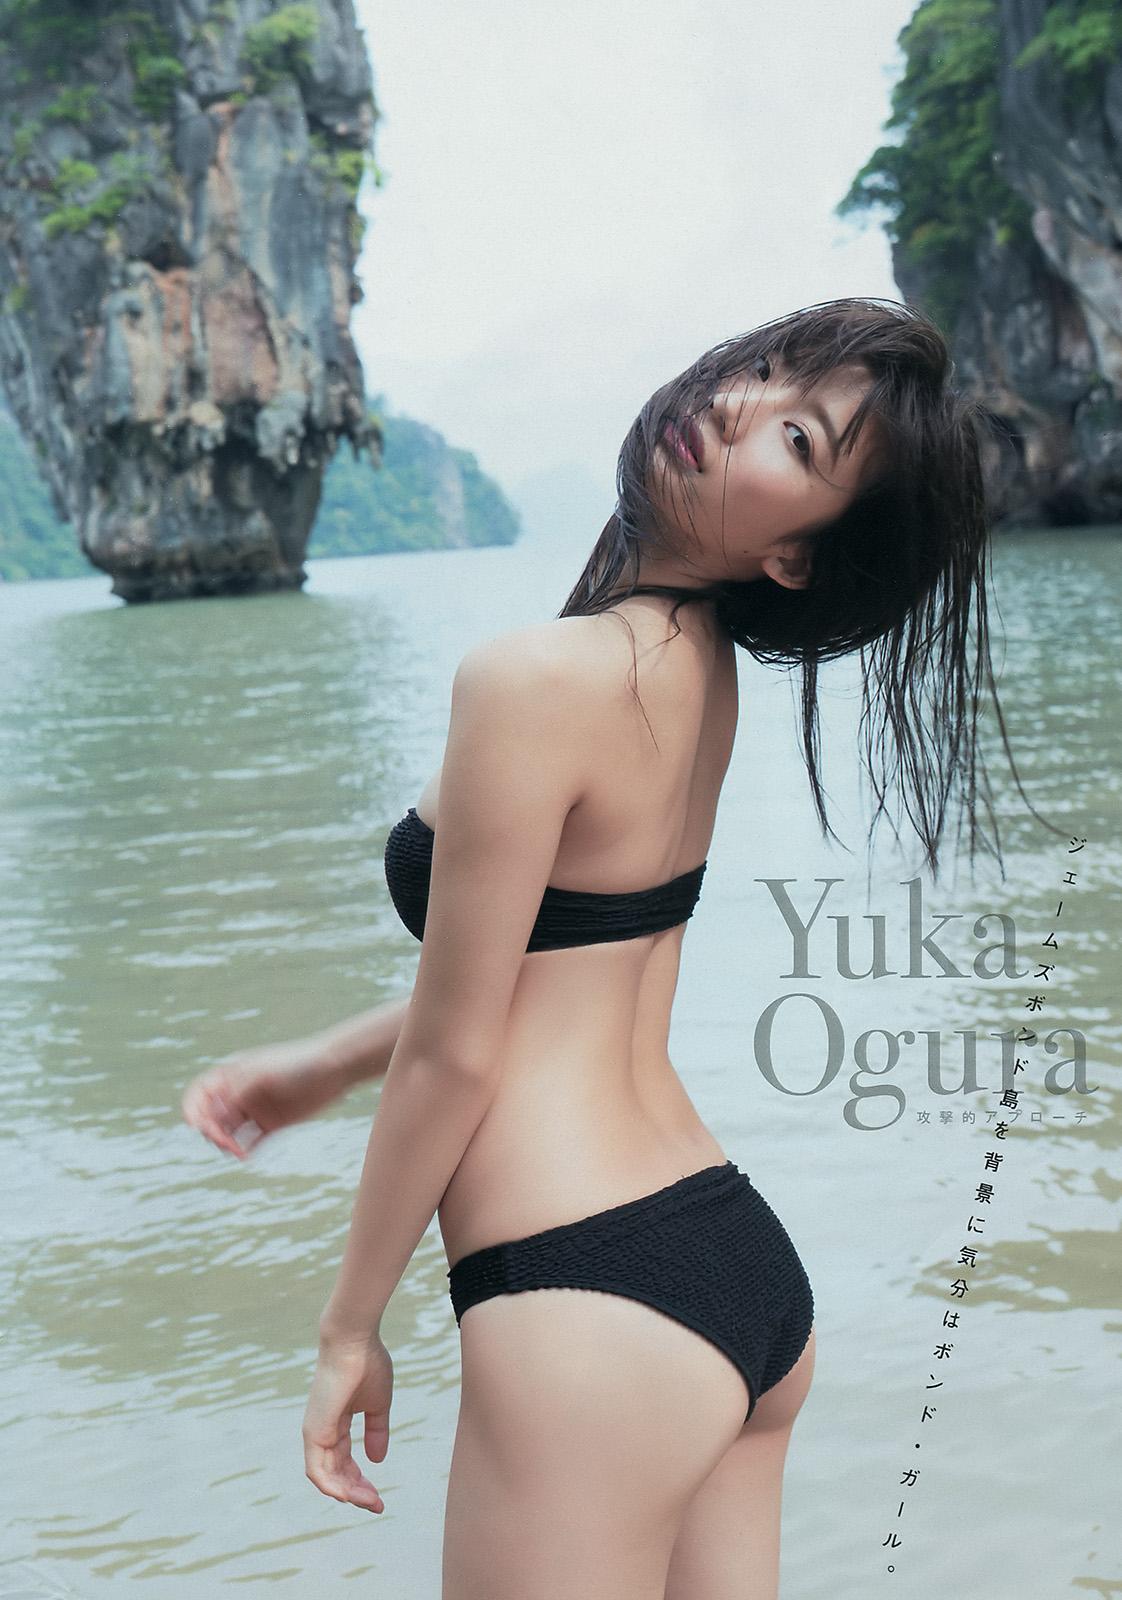 Yuka Ogura 小倉優香, Young Magazine 2018 No.04-05 (週刊ヤングマガジン 2018年4-5号)